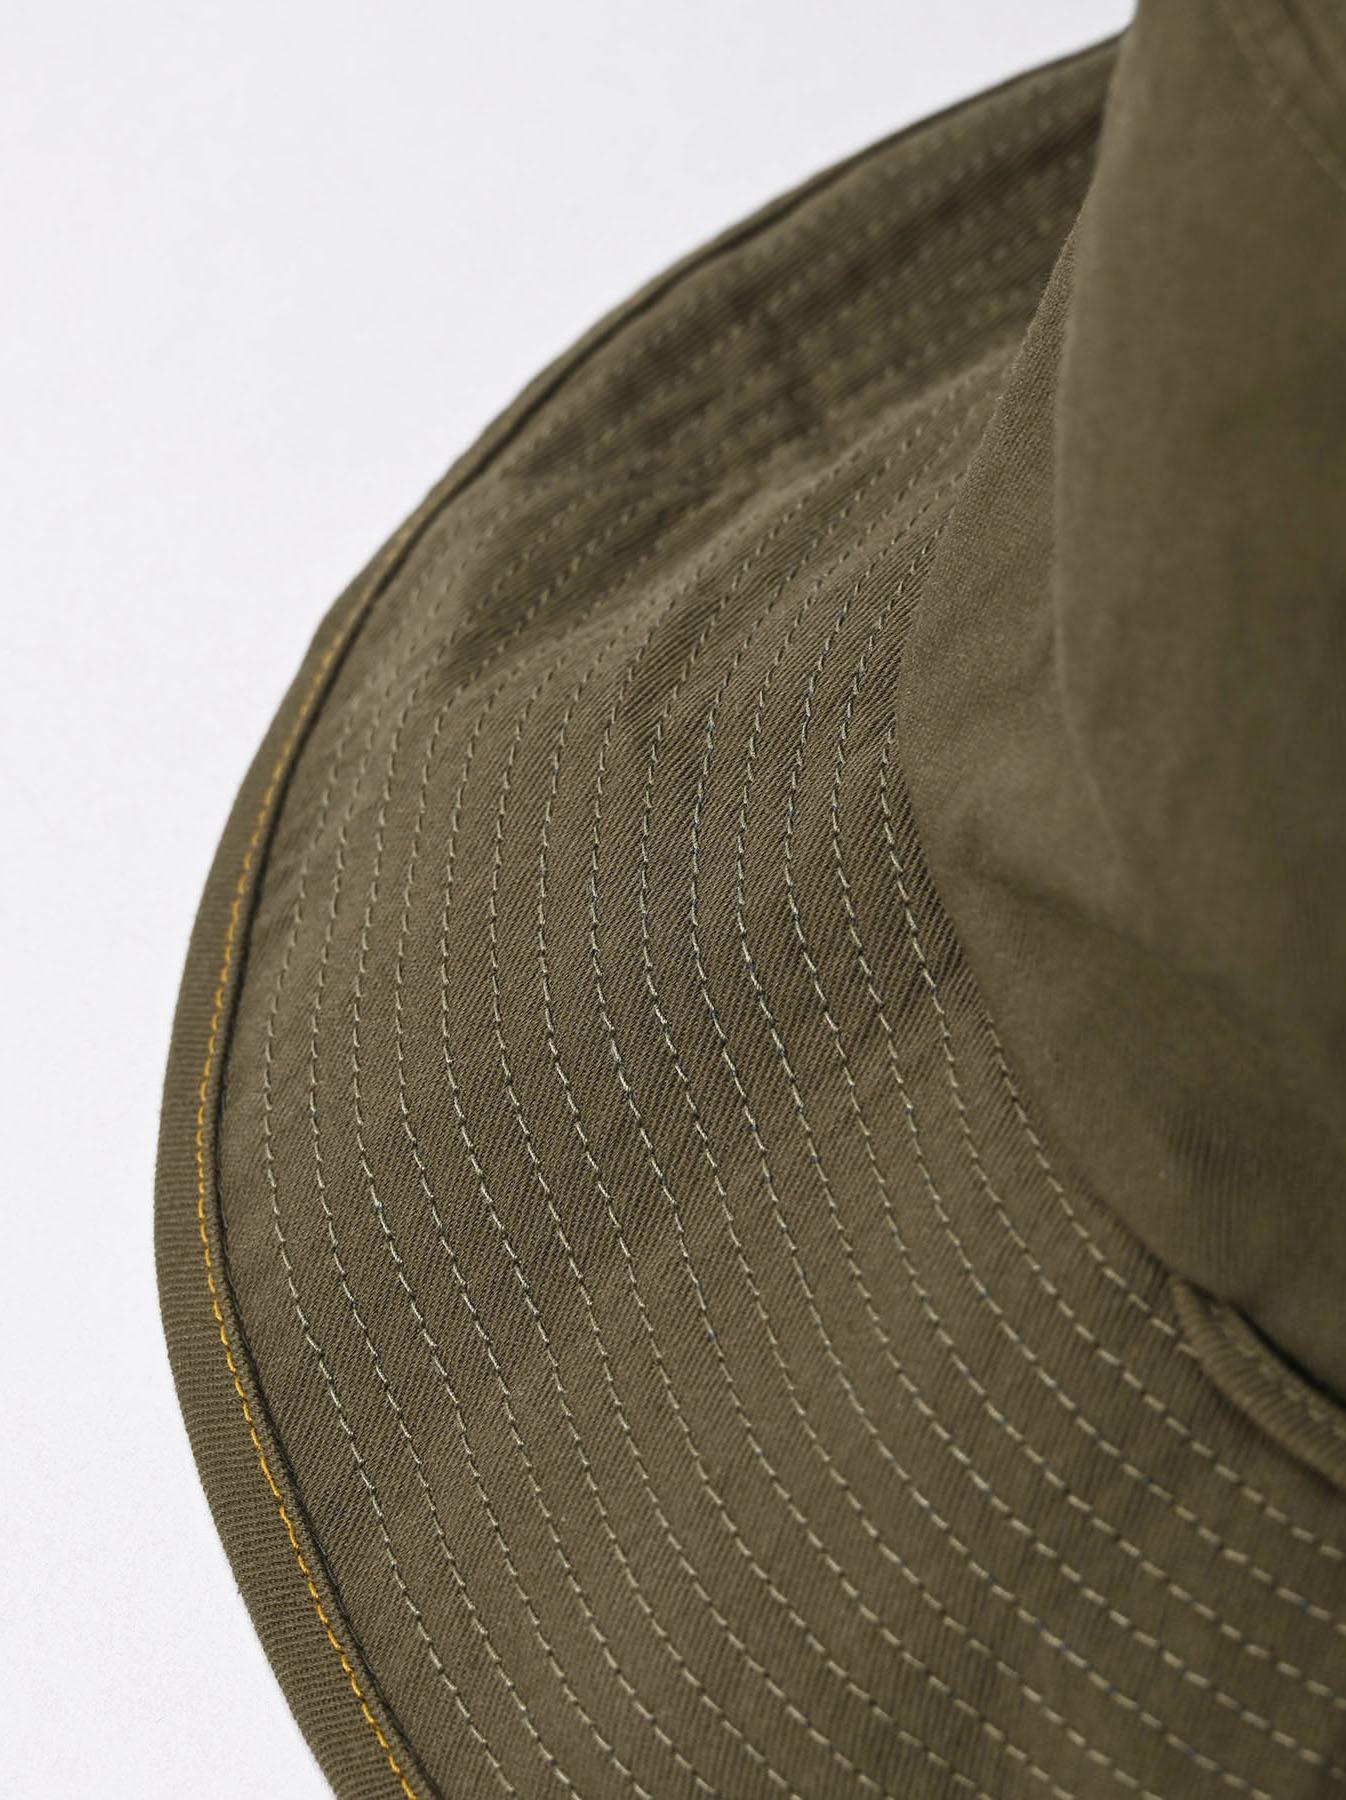 Okome Chino Sail Hat (0521)-7